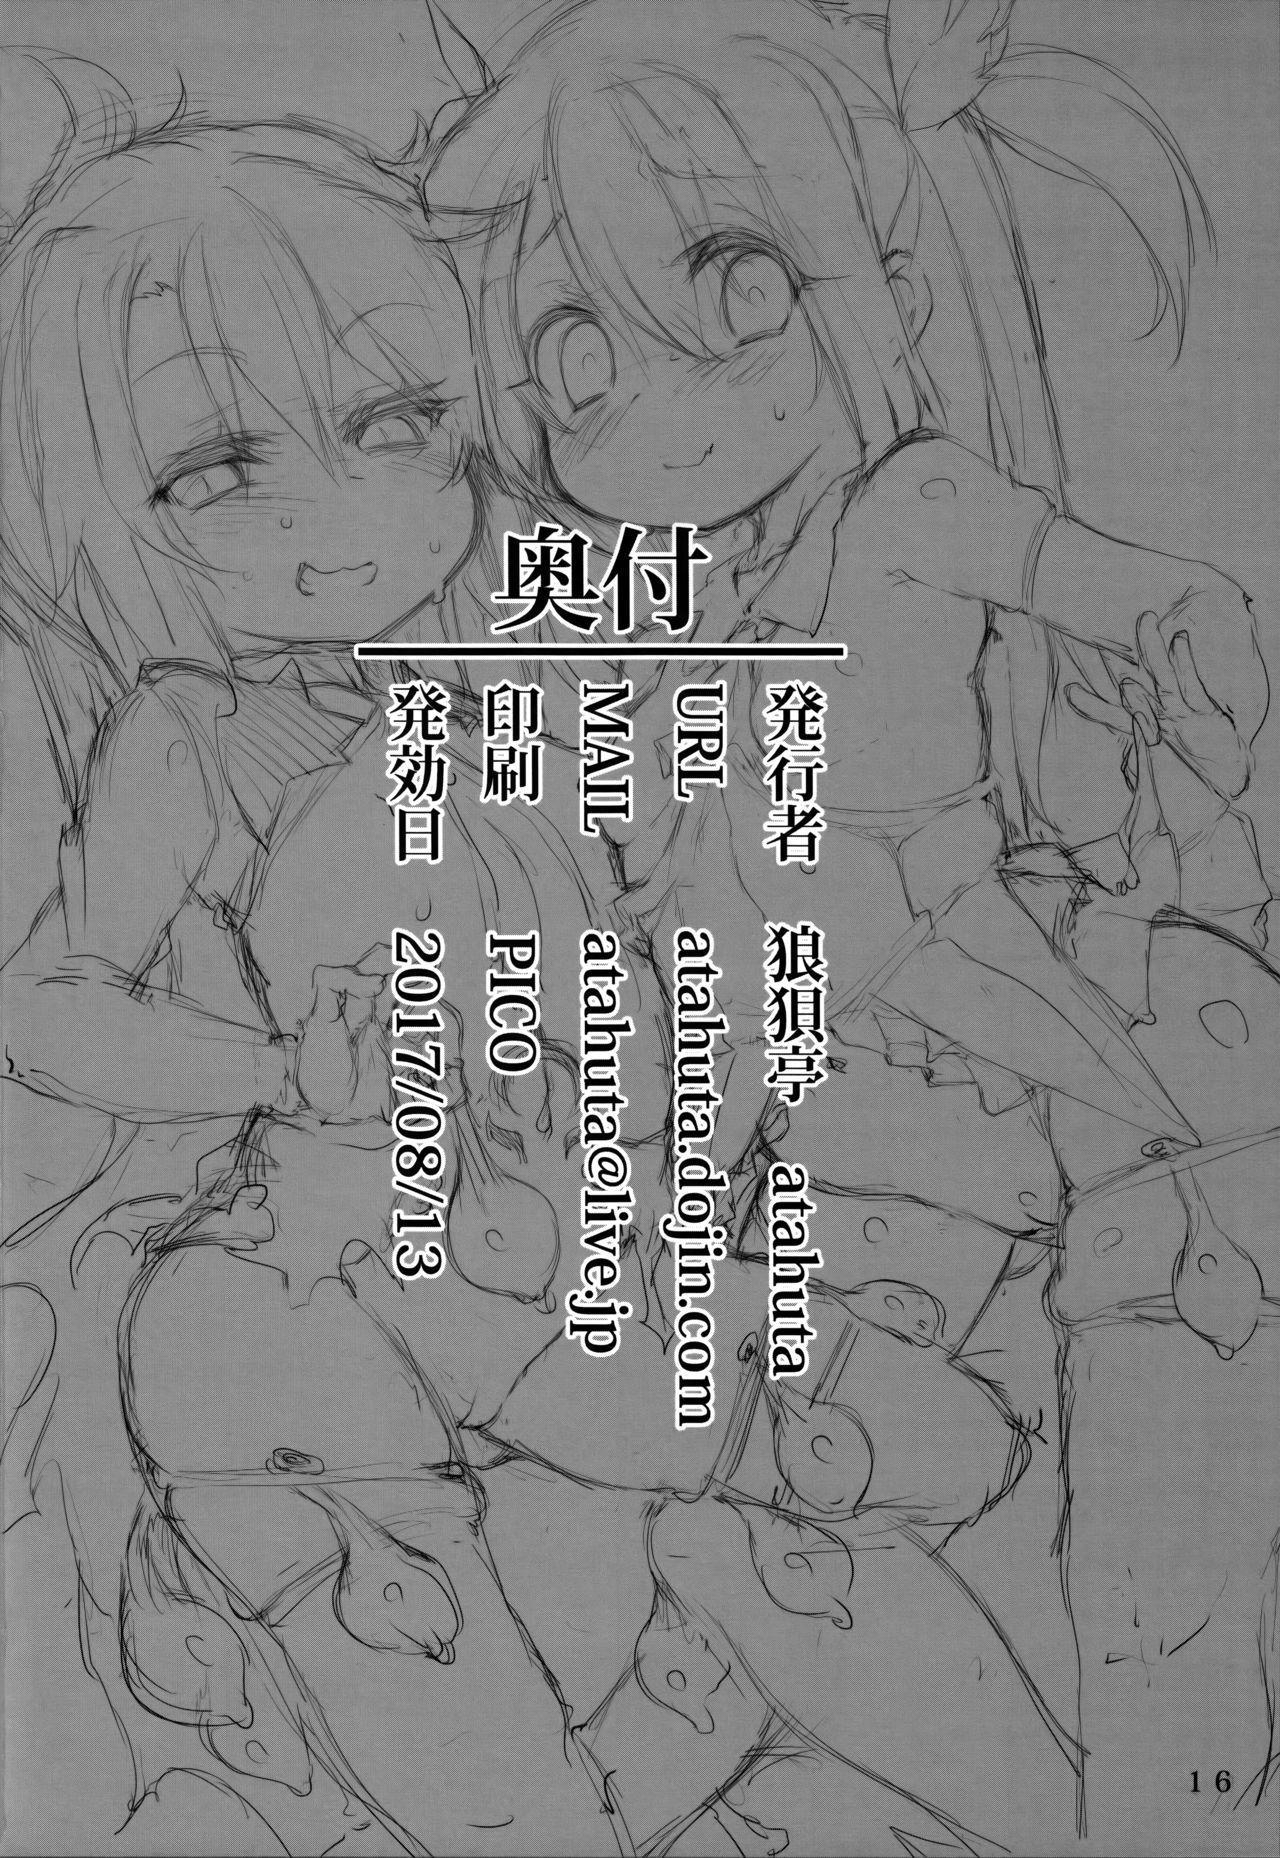 (C92) [Roubai-tei (atahuta)] Double Bind ~Seisou Seiatsu~ | Double Bind ~Testicular Suppression~ (Fate/kaleid liner Prisma Illya) [English] [Mongolfier] 16